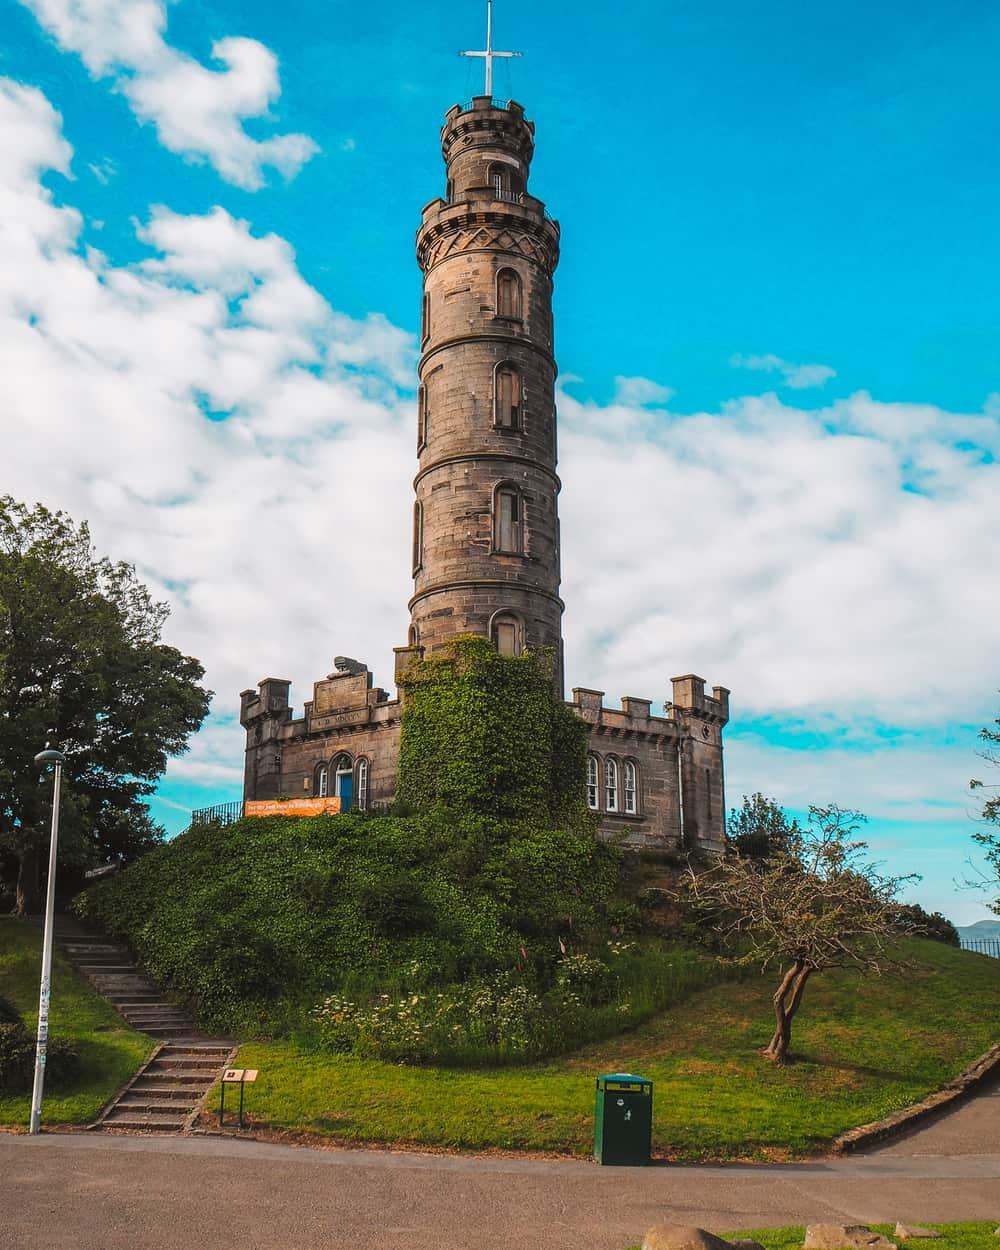 The Nelson Monument Calton Hill Edinburgh